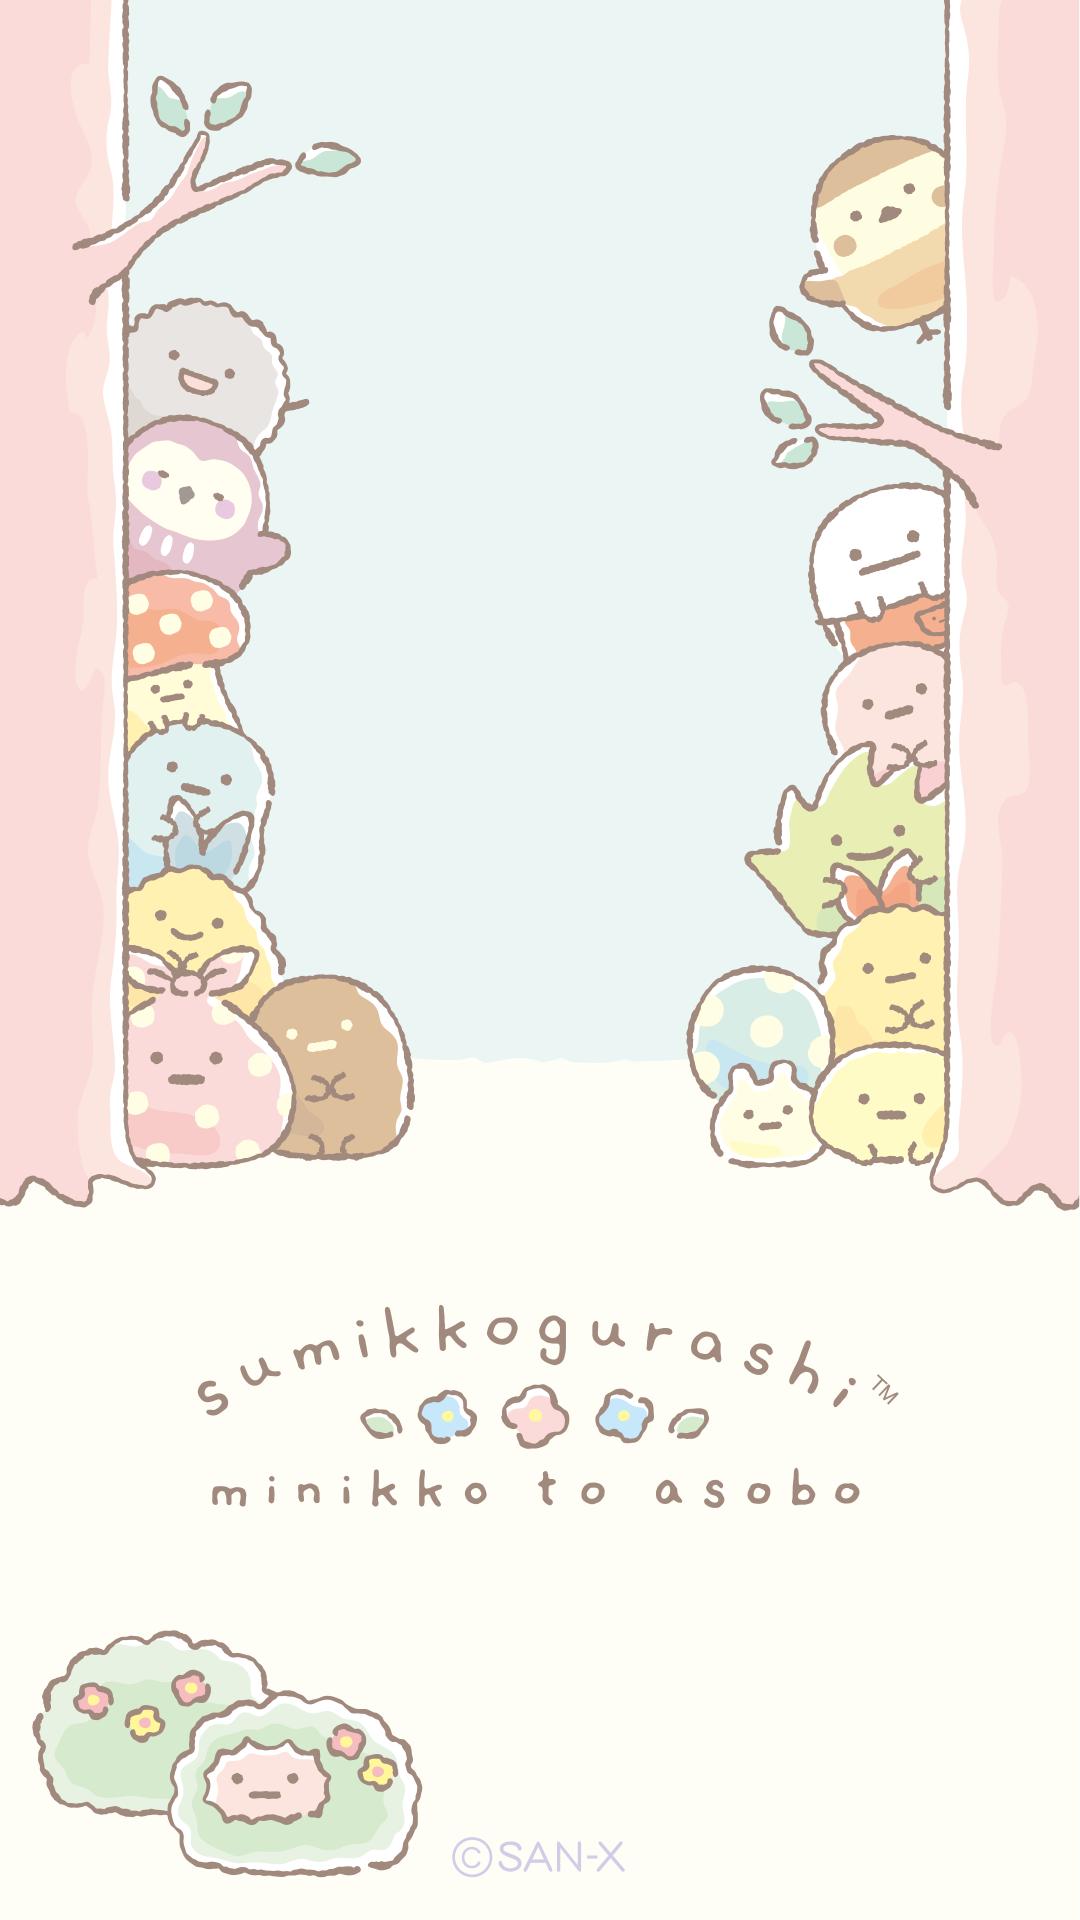 Sumikko Minikko to Asobo smartphone wallpaper